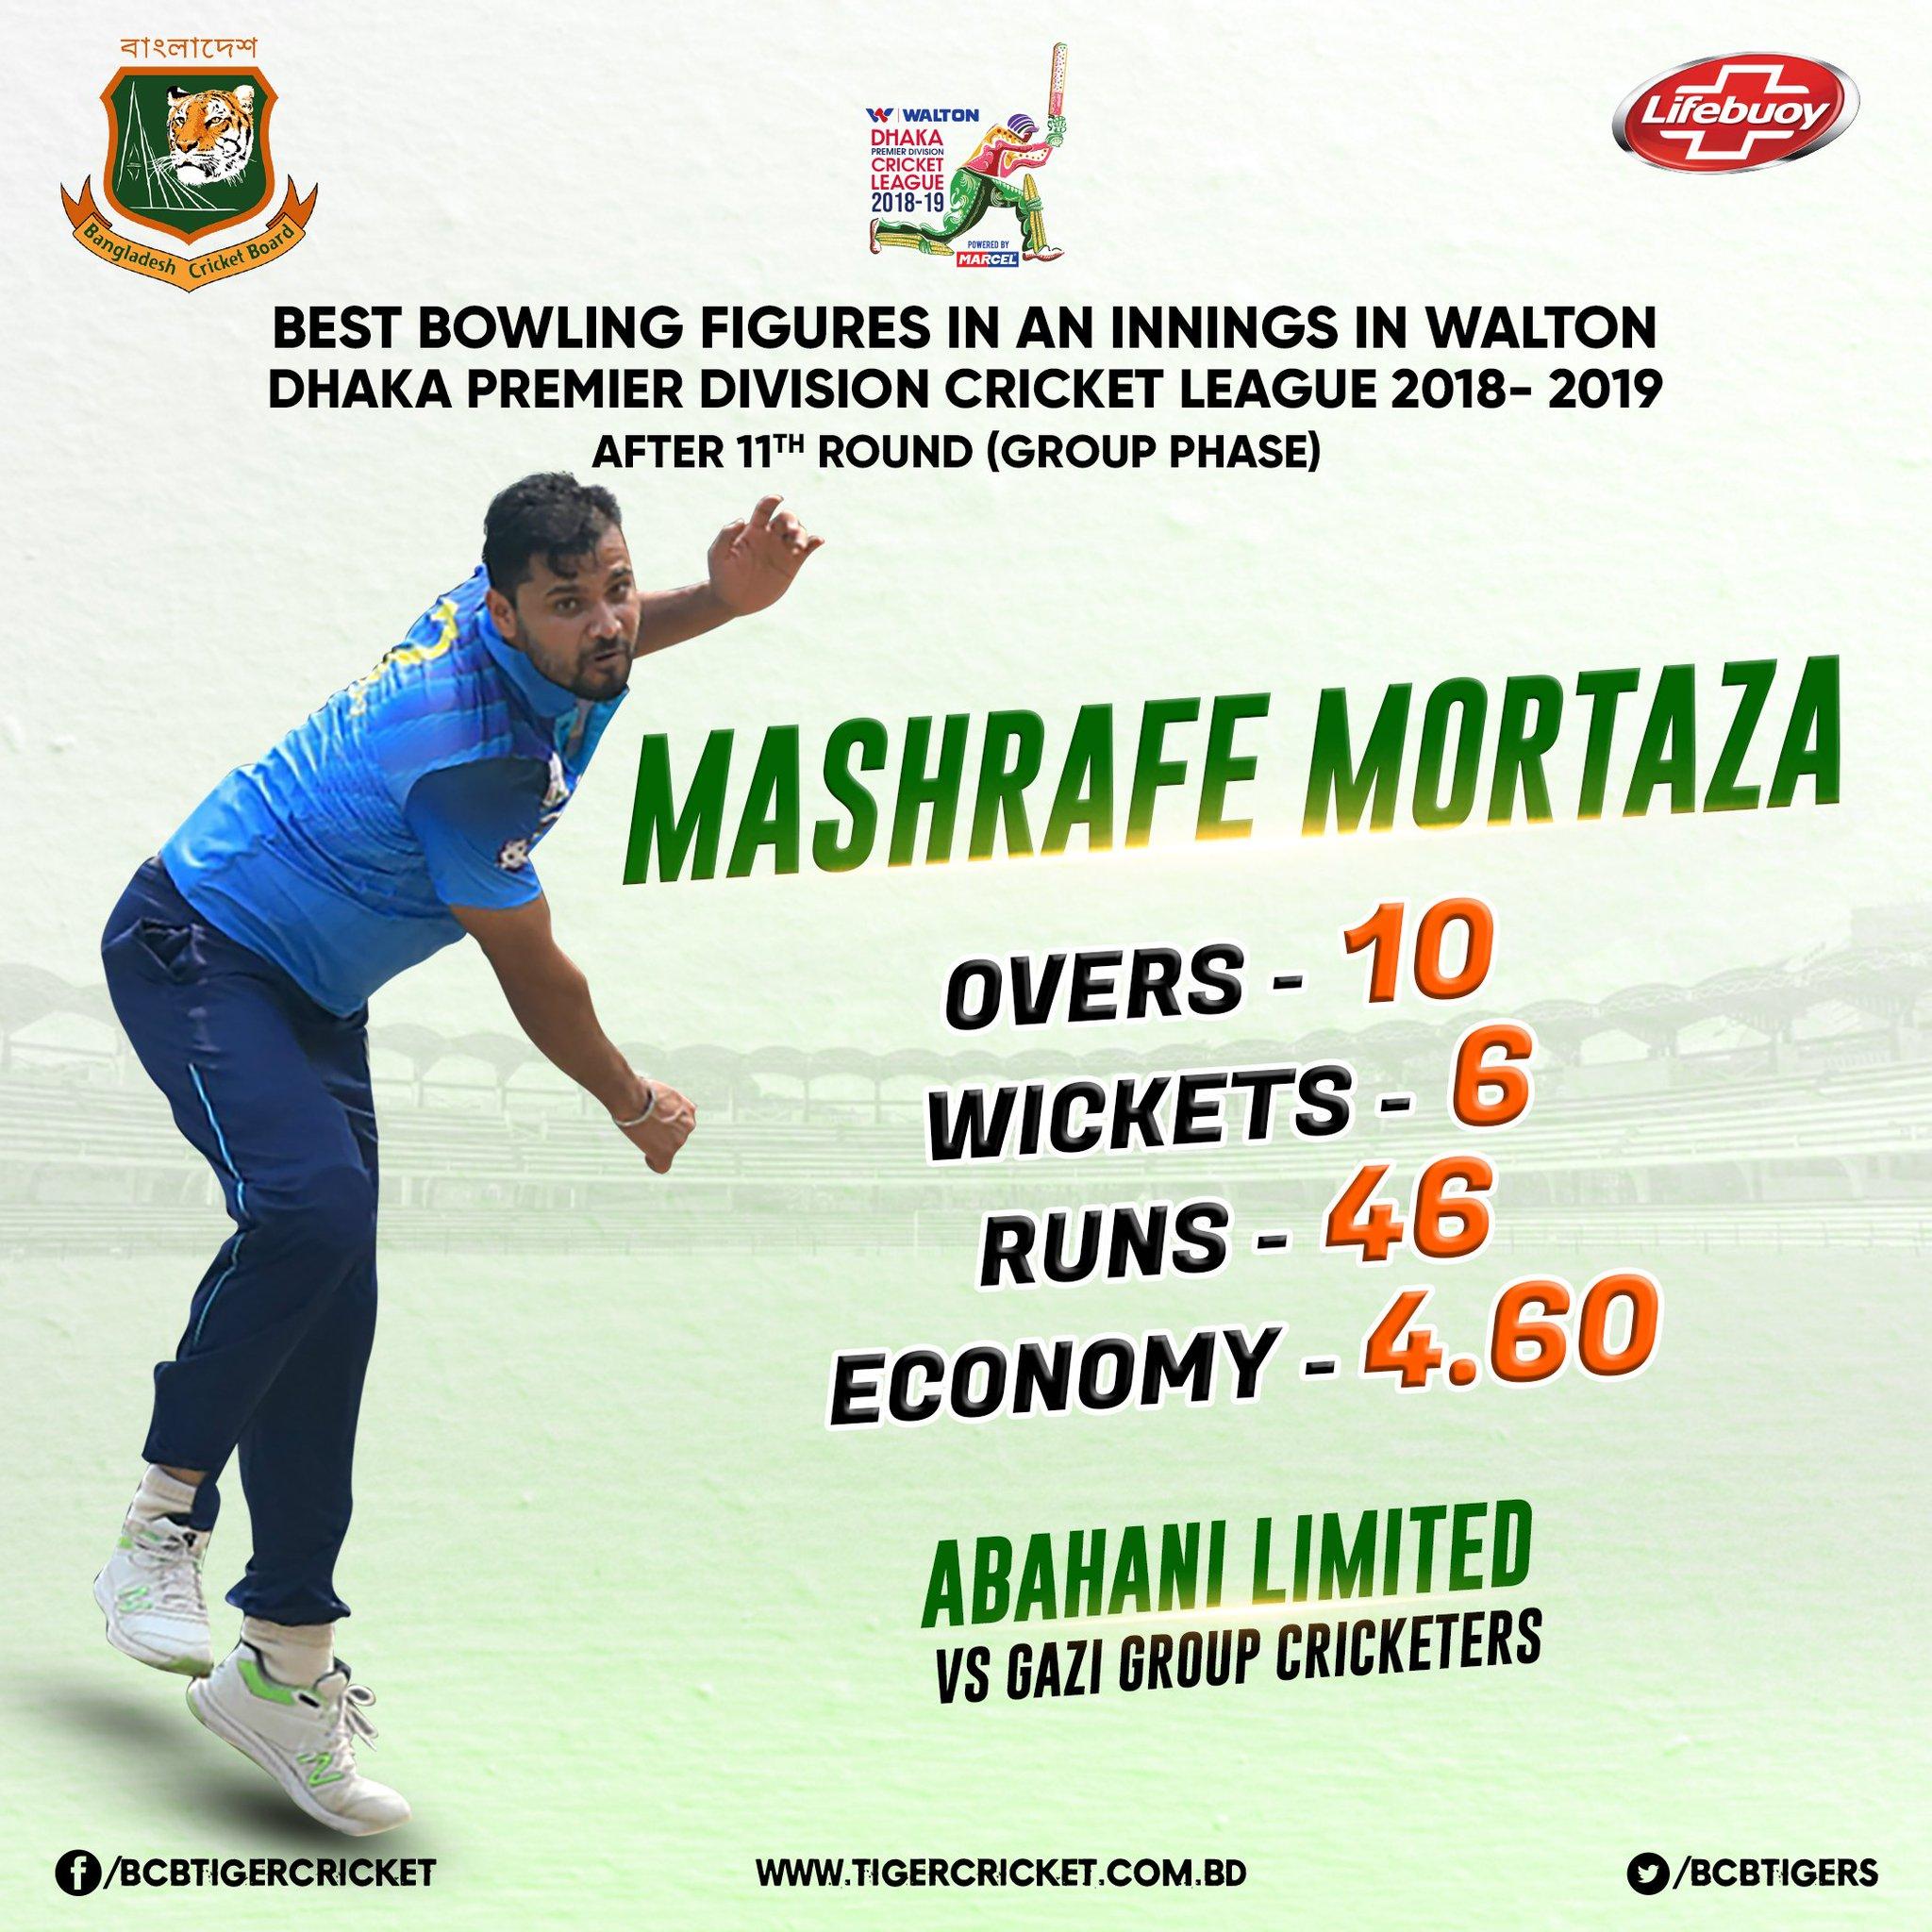 Bangladesh National Cricket Team - Twitter Photo - Mashrafe